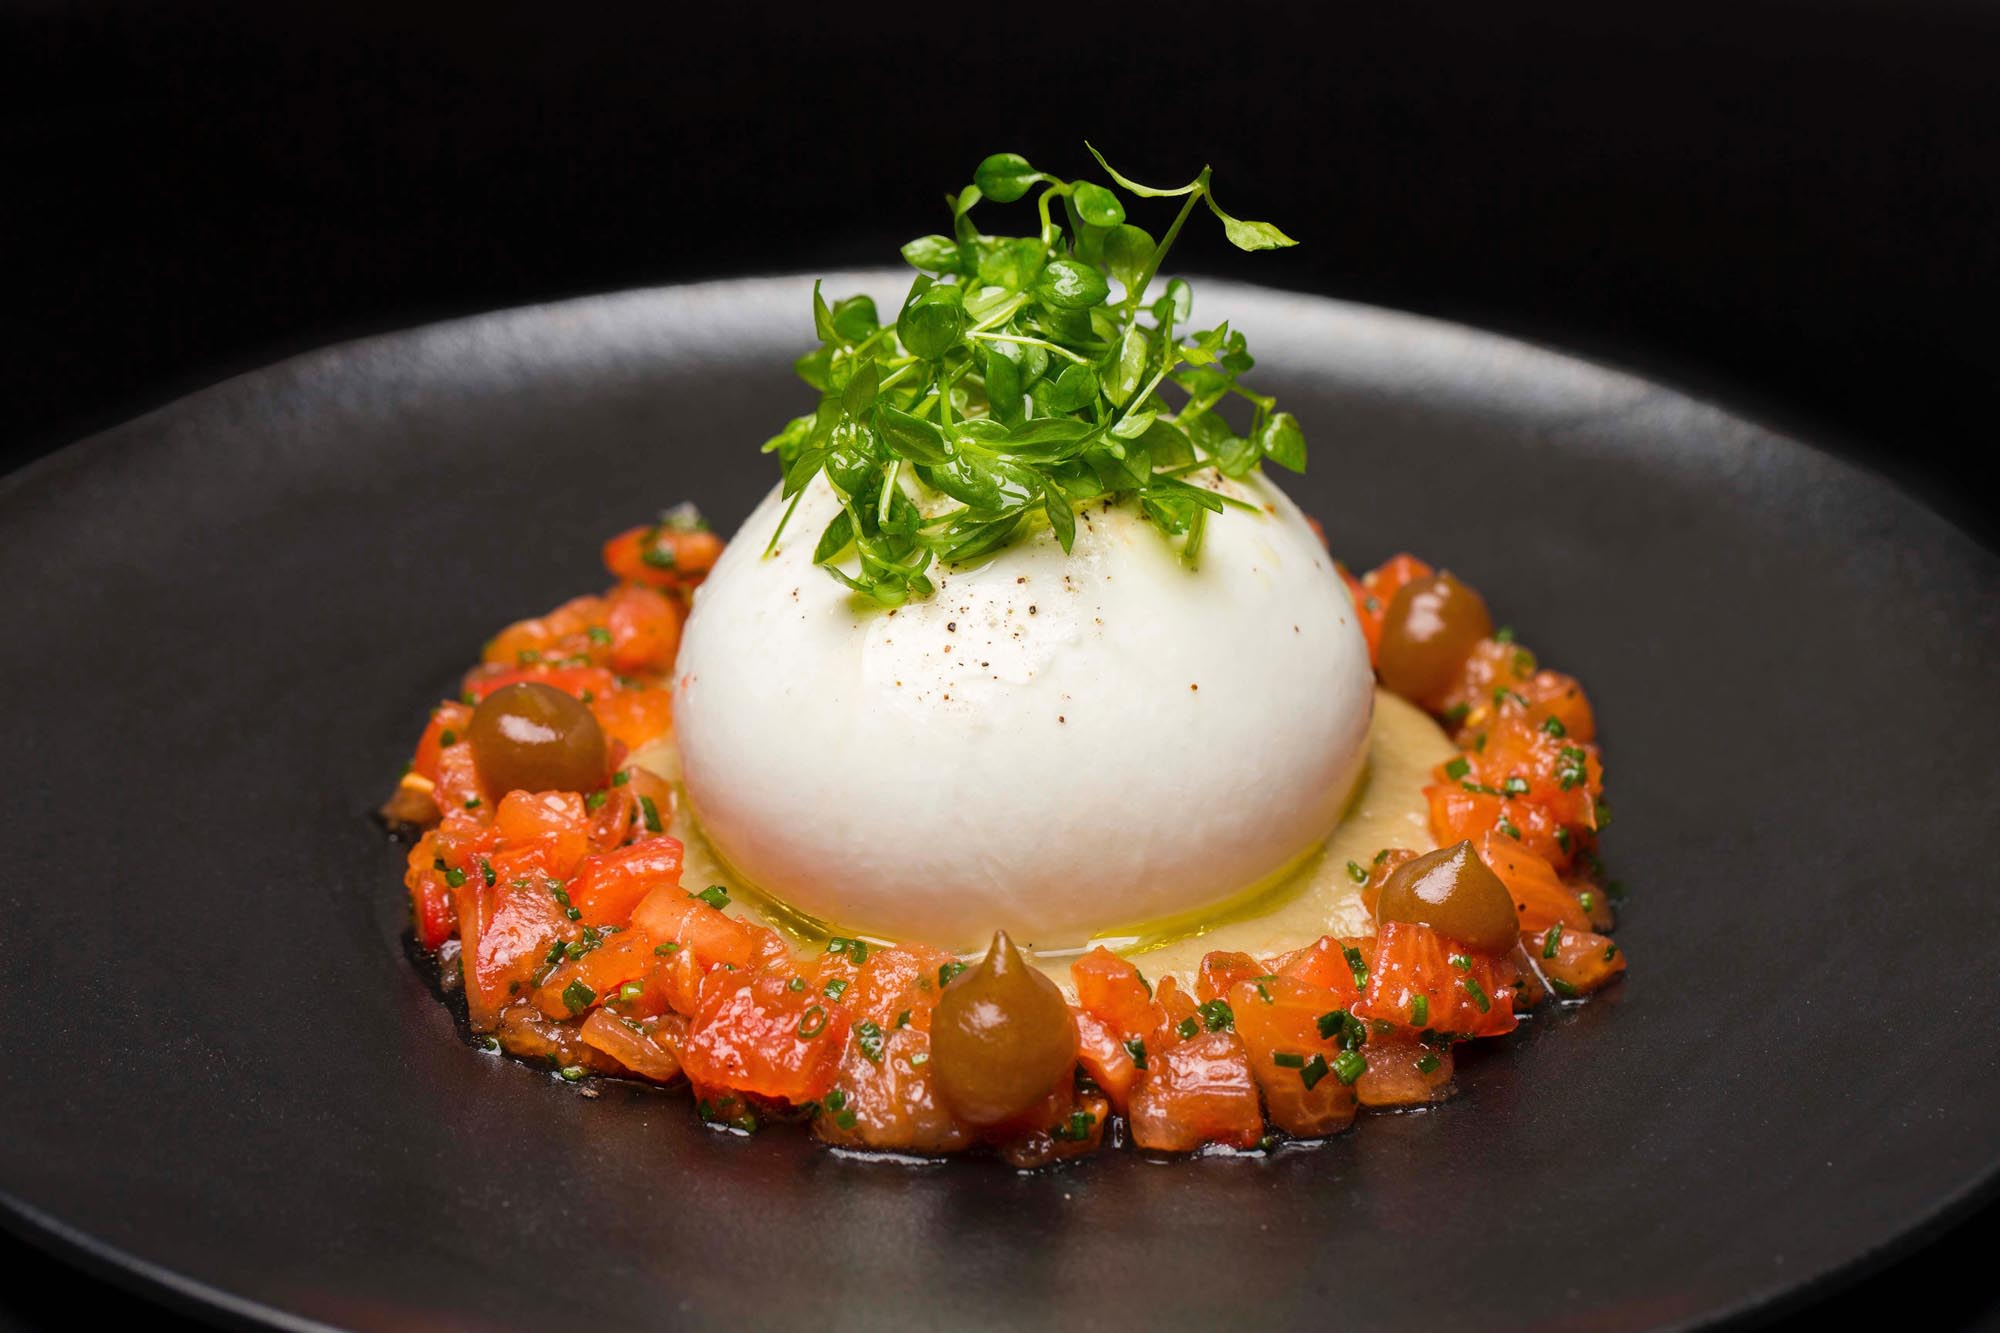 Burrata con tomate, cremoso de berenjena asada, gel de dátiles y ensalada de concasse. Foto: 'Avec'.